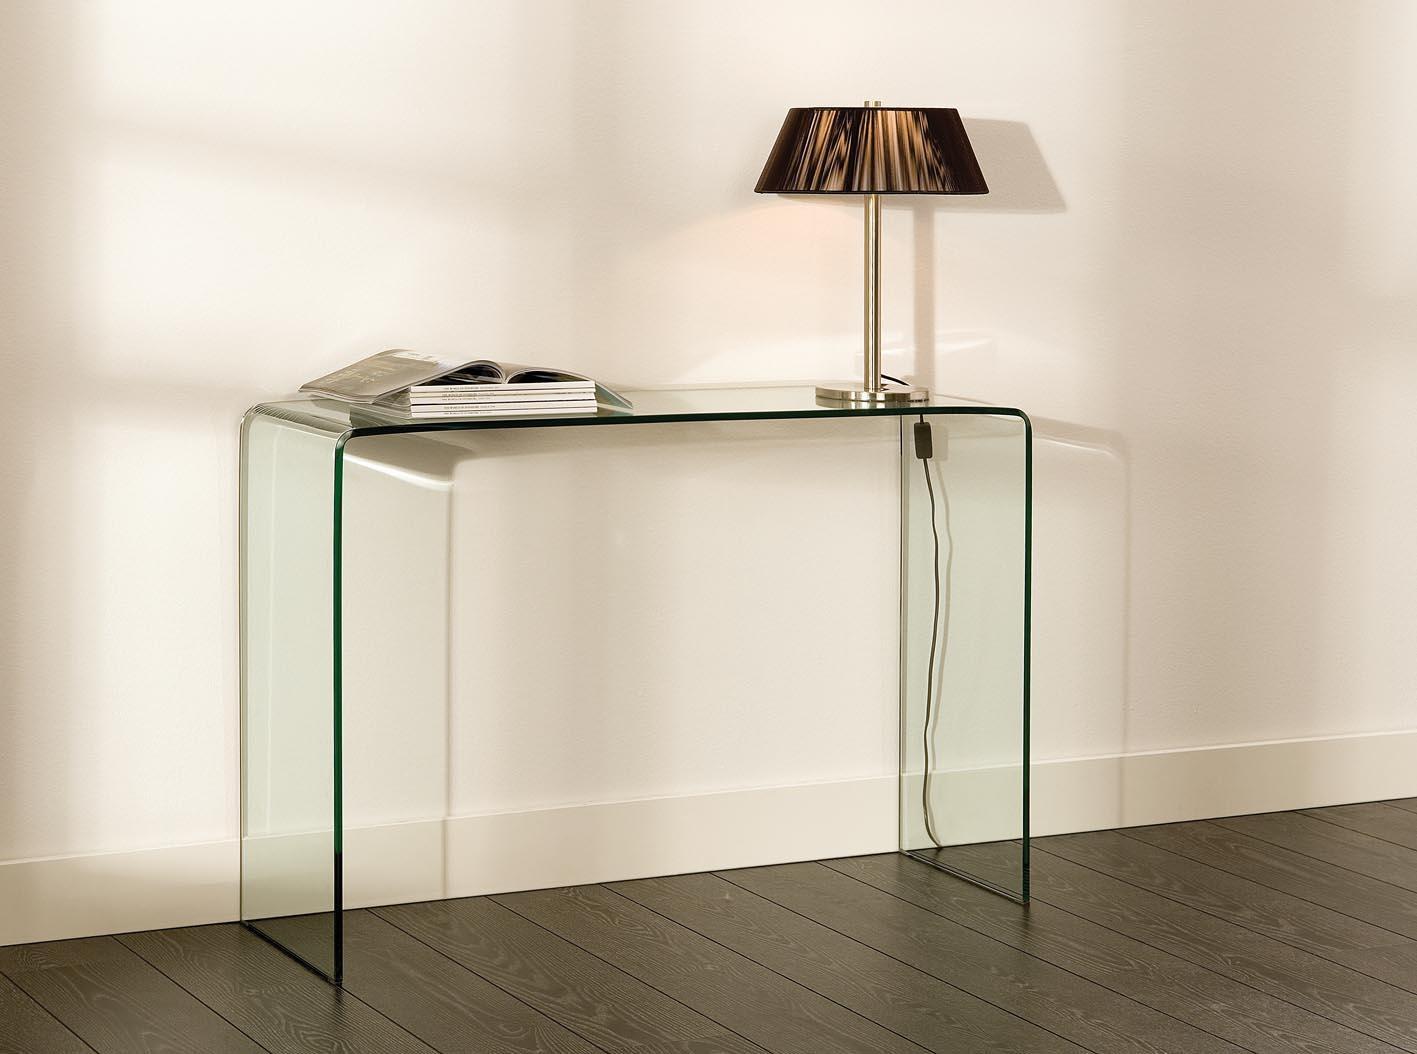 Glazen Wandtafel Sidetable.Glazen Side Table Biarritz